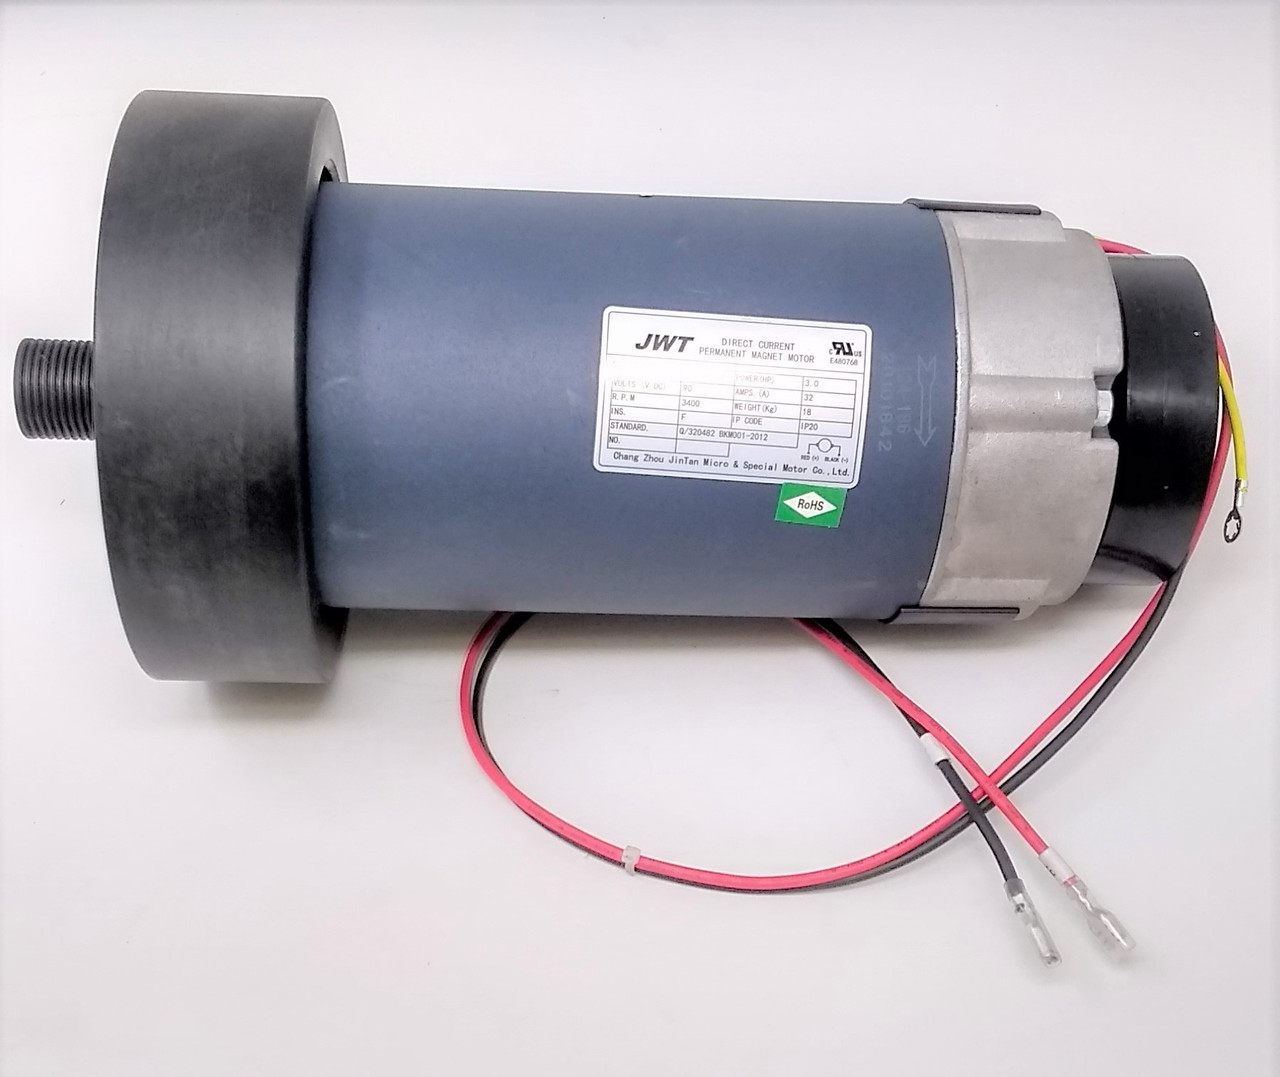 BowFlex Treadmill Model BXT216 Drive Motor Part Number 8010893